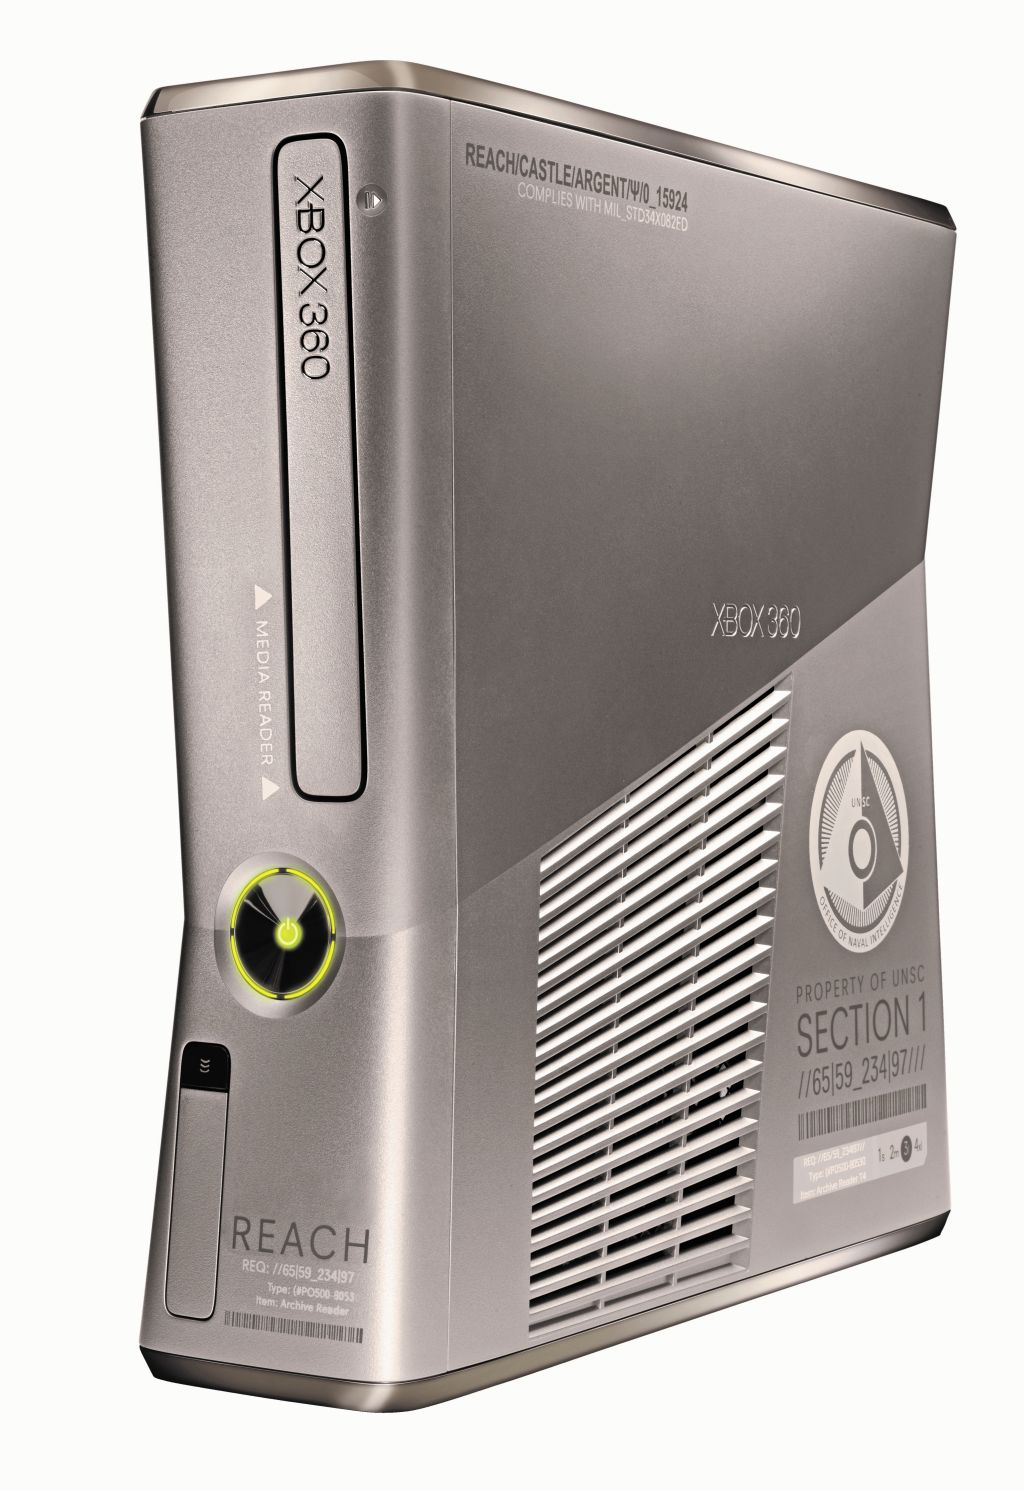 Halo reach limited edition slim xbox 360 console